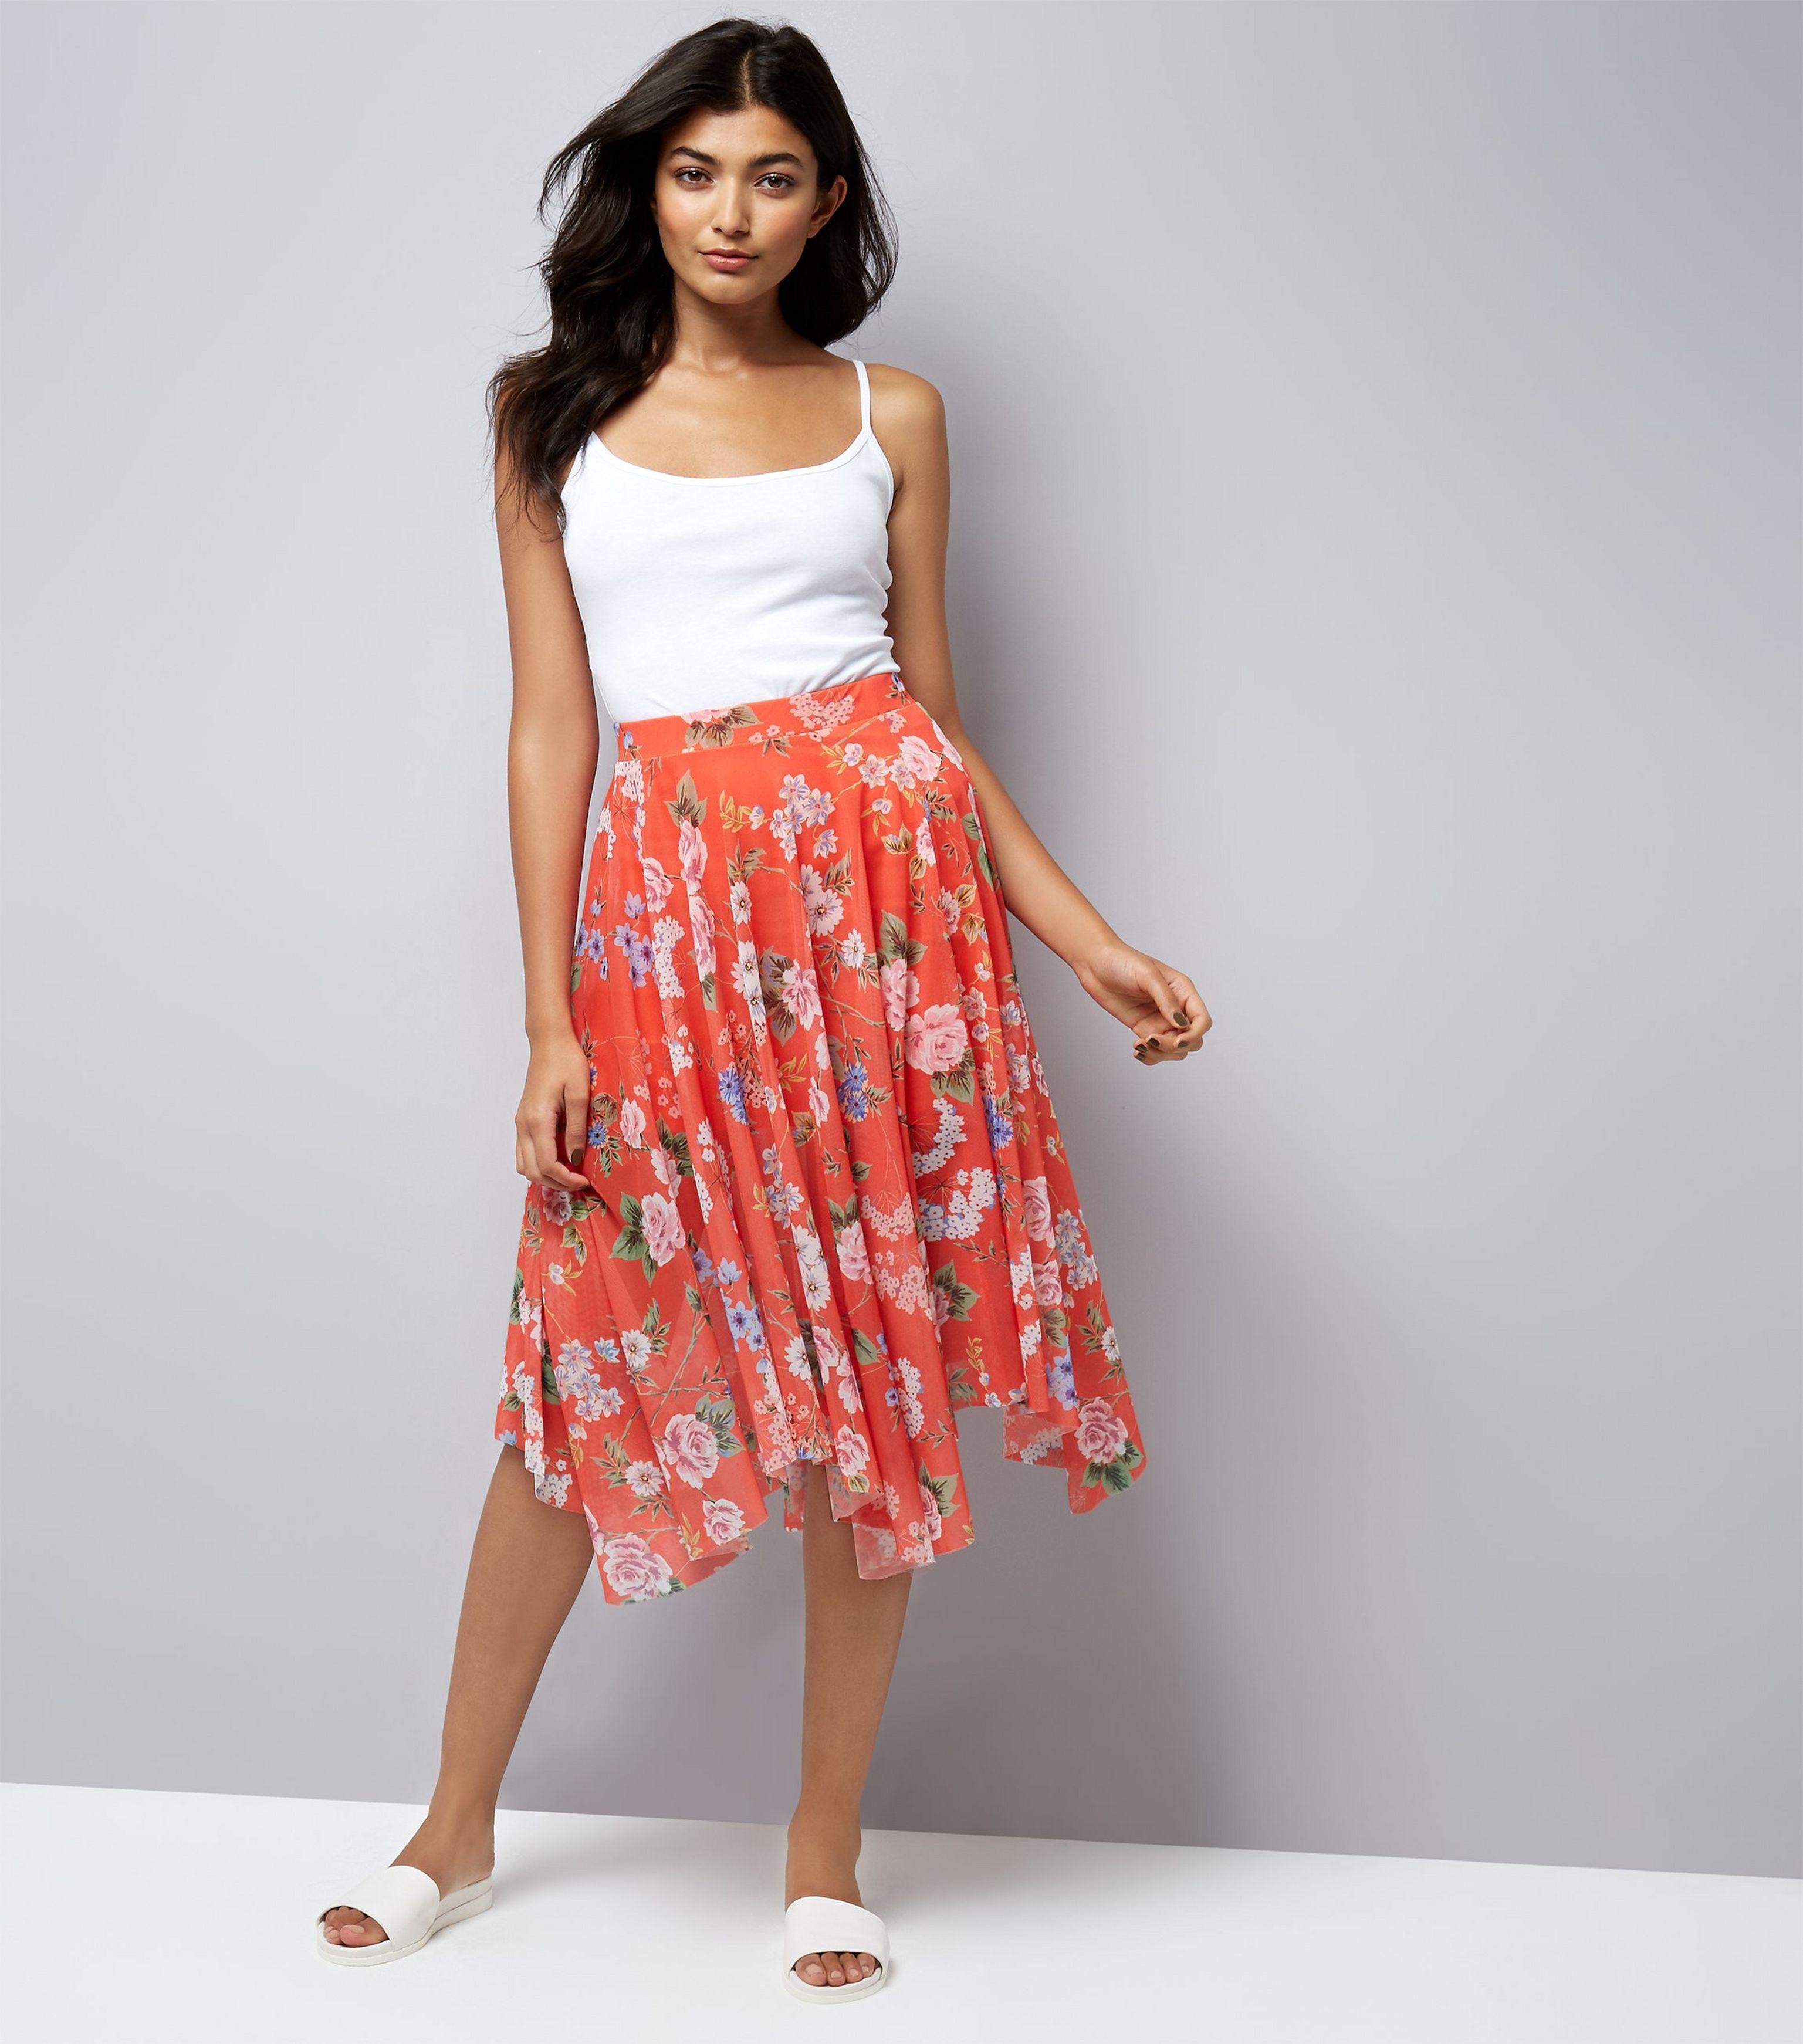 30dc1f4ec6 New Look Red Floral Print Mesh Hanky Hem Midi Skirt in Red - Lyst